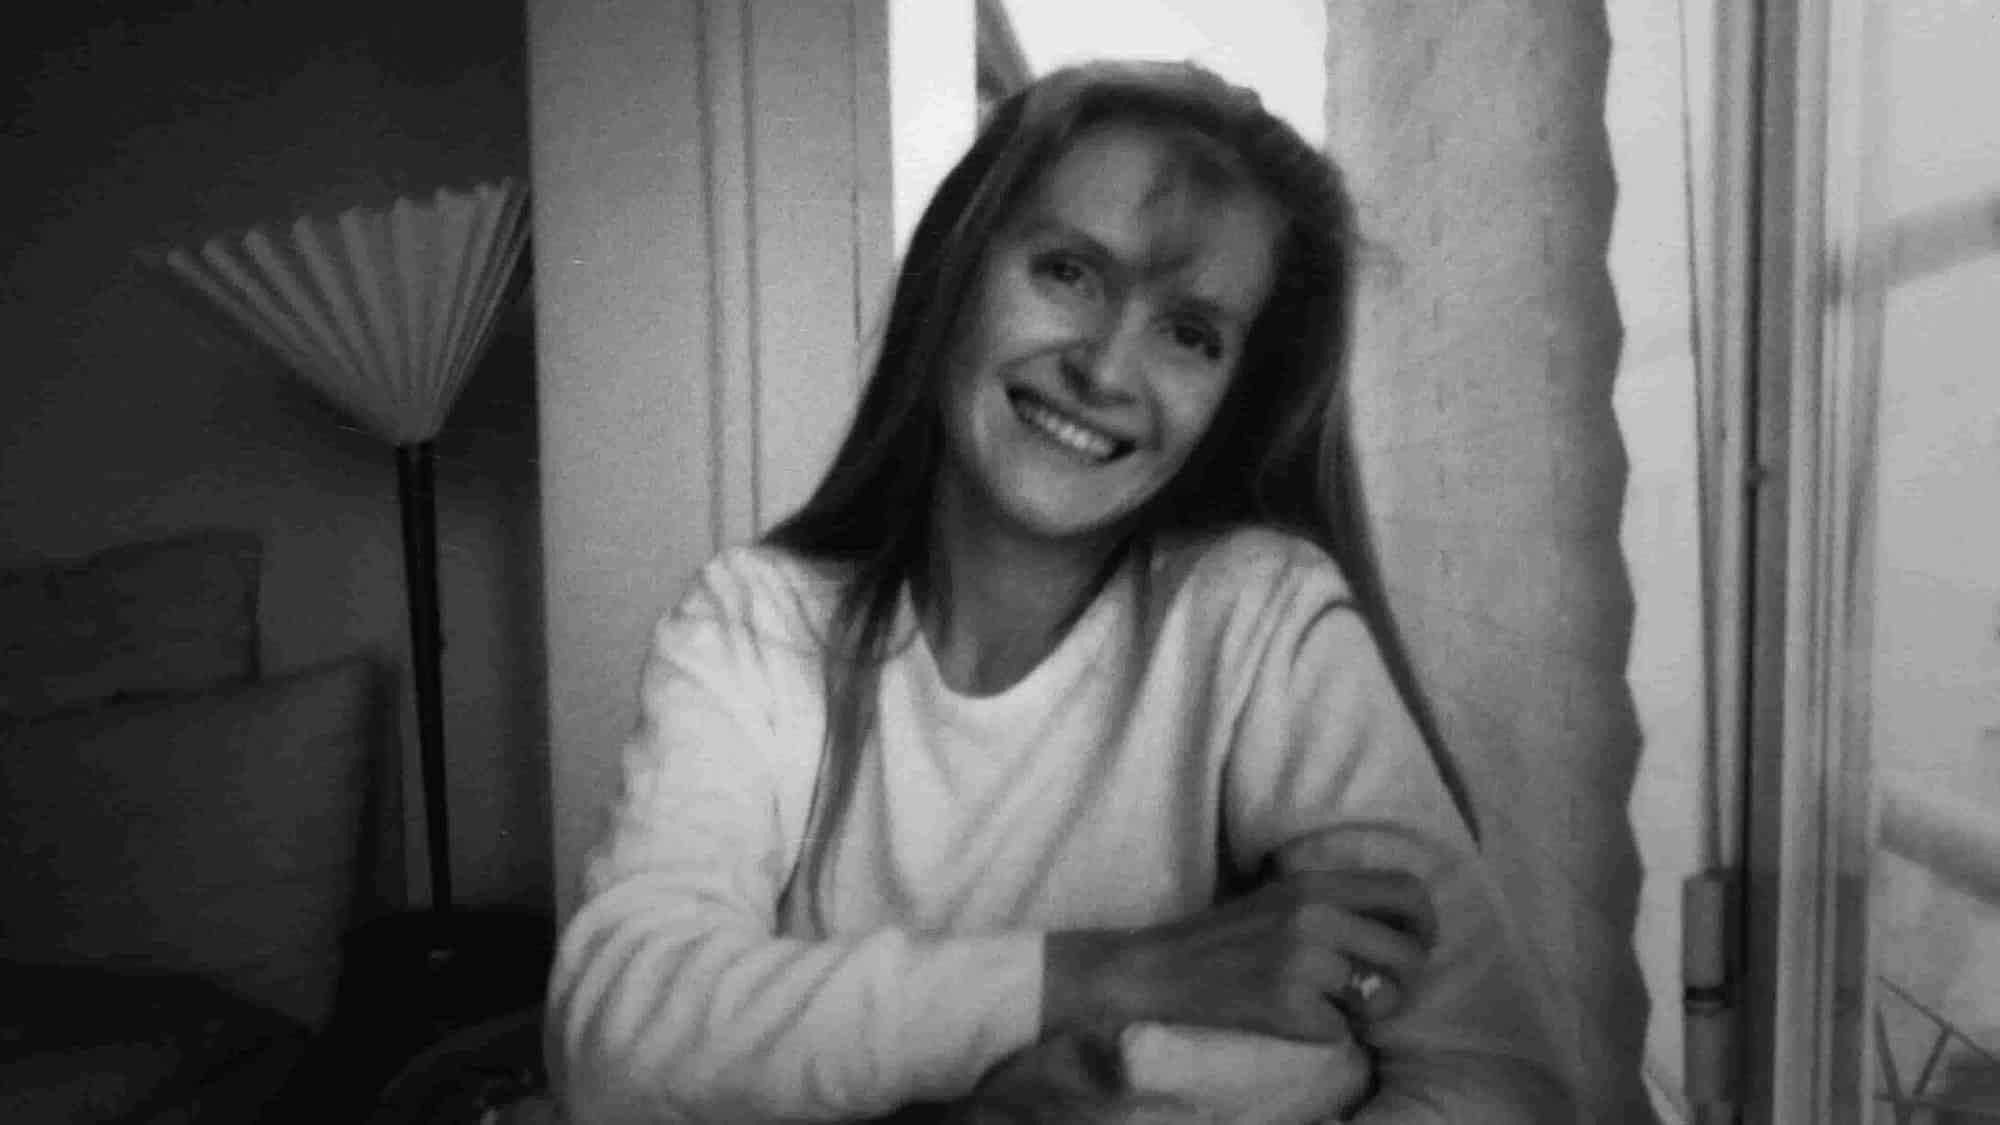 Femminicidio di Sophie Toscan du Plantier - Netflix - Sophie A Murder in West Cork - magazine Il Biondino della Spider Rossa - ProsMedia - Agenzia Corte&Media---